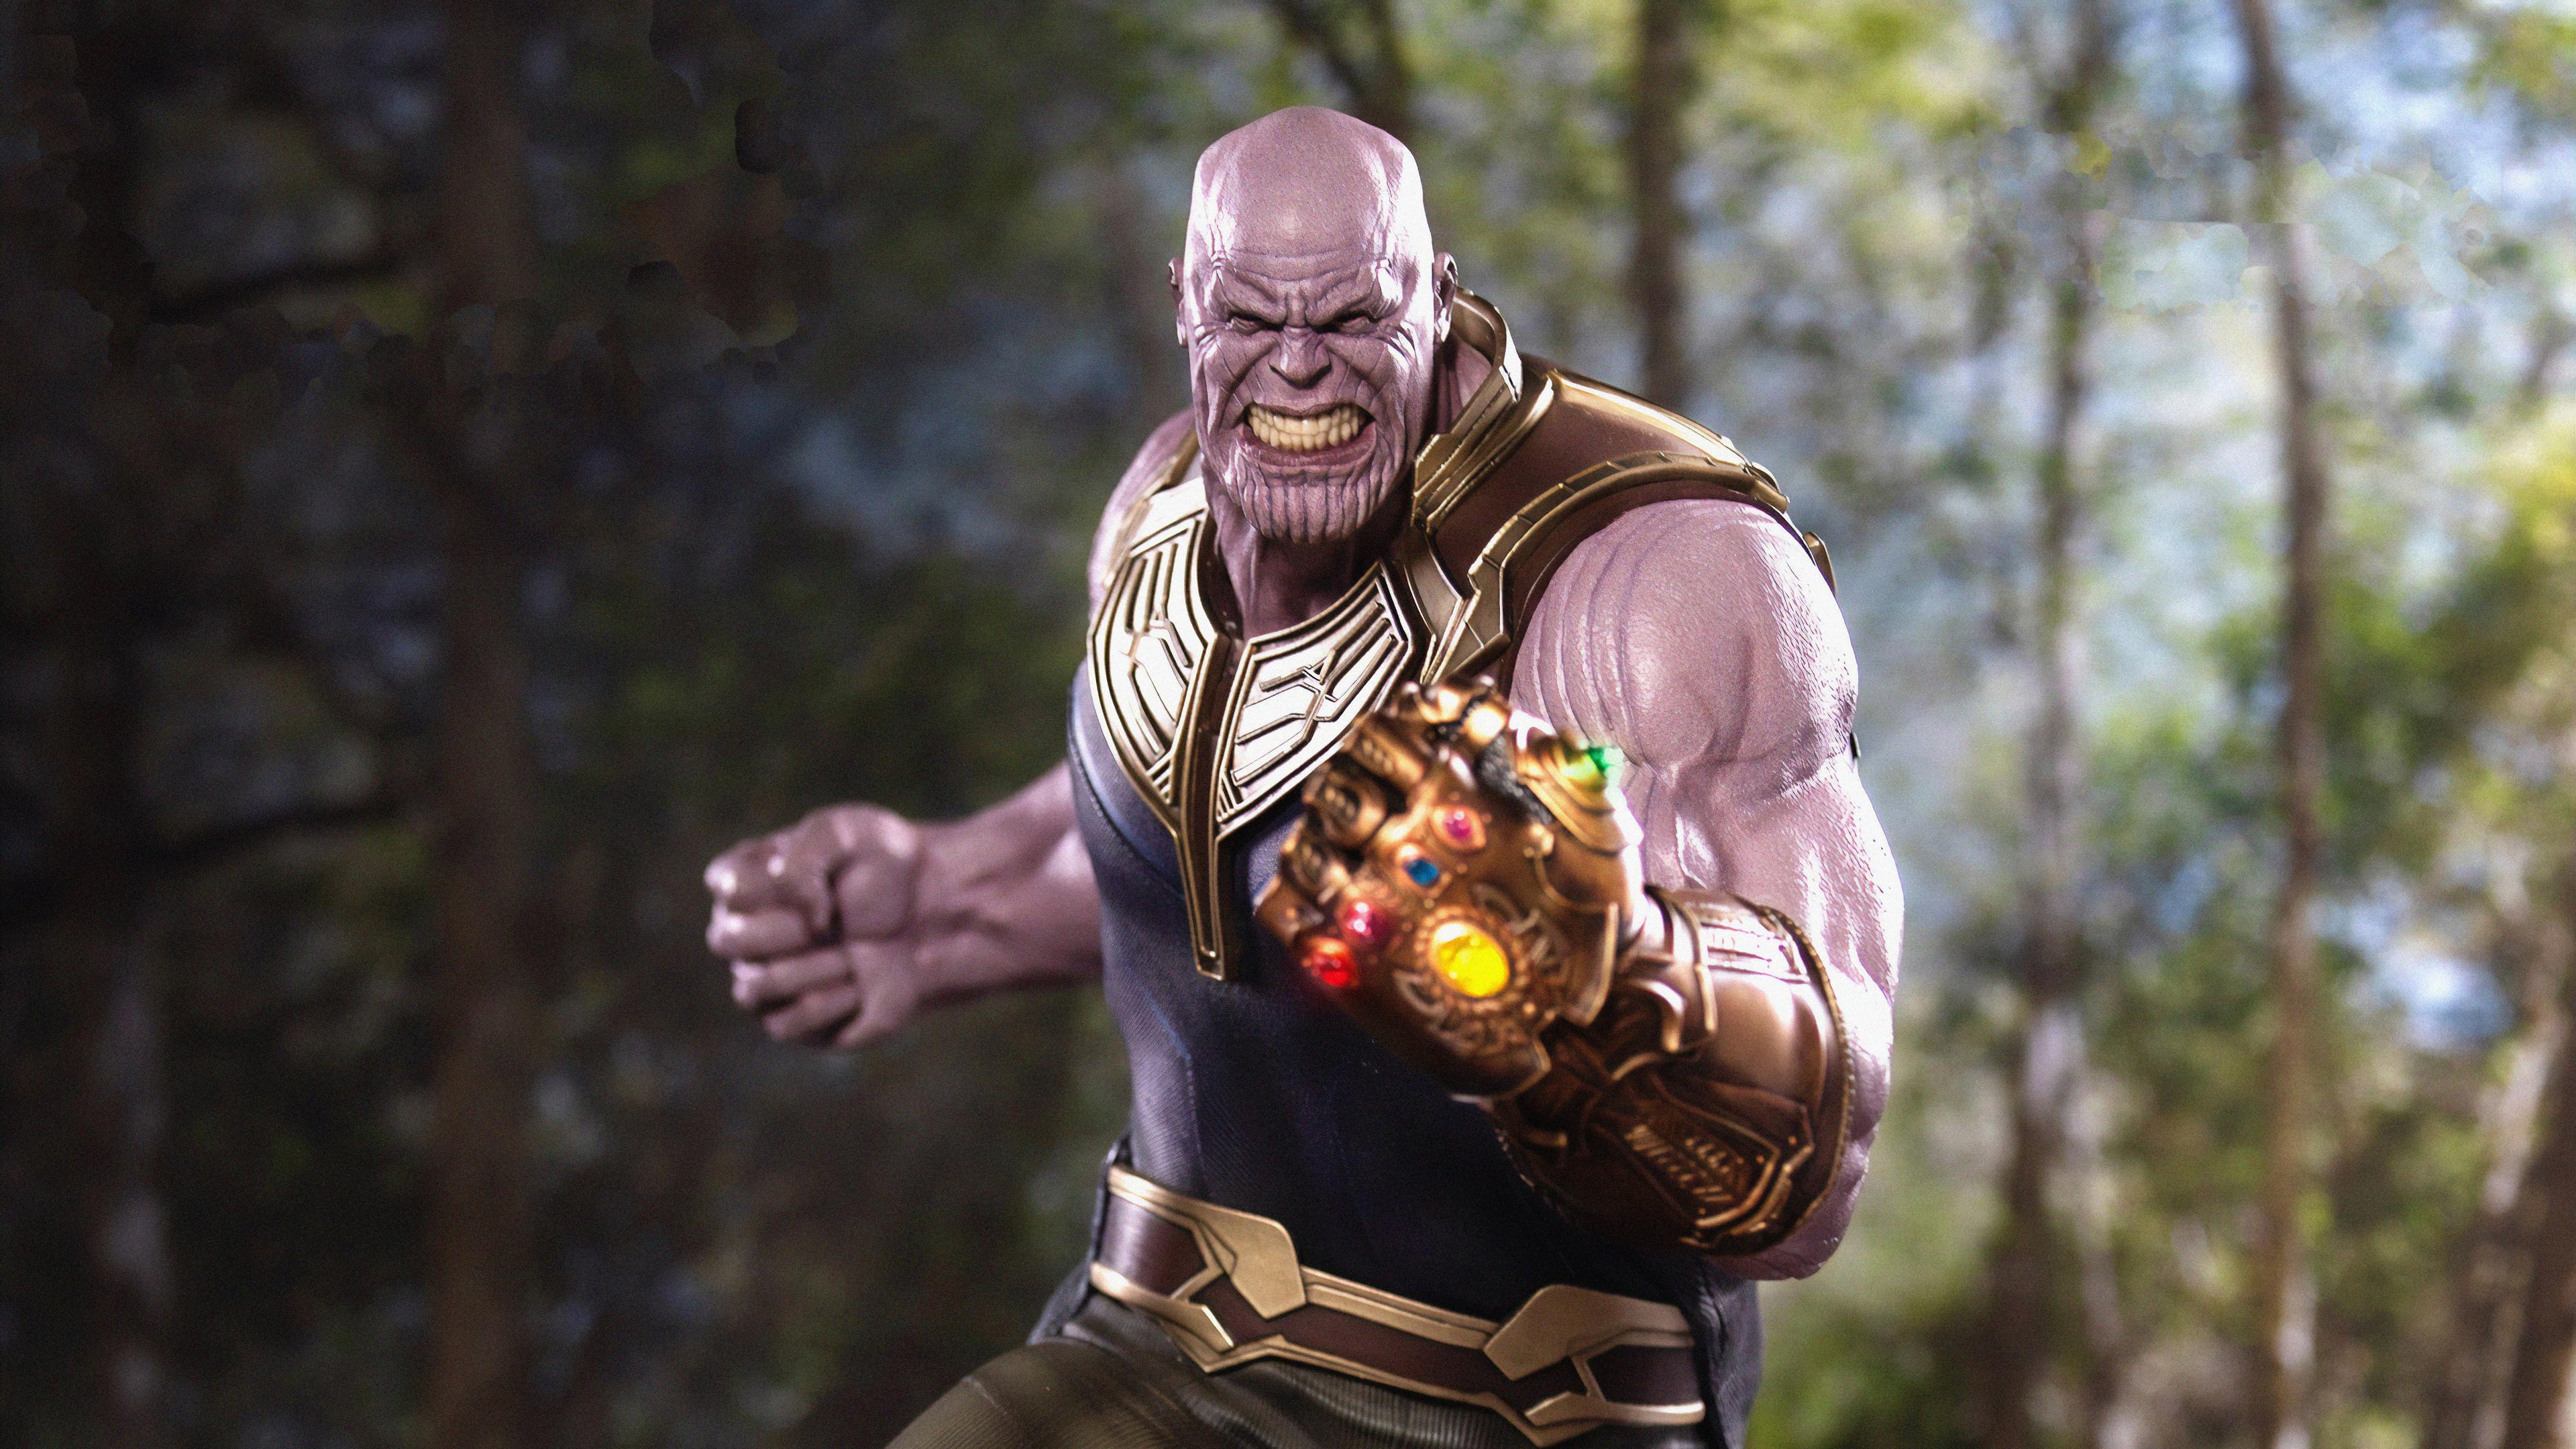 thanos infinity gauntlet 1563220262 - Thanos Infinity Gauntlet - thanos-wallpapers, supervillain wallpapers, superheroes wallpapers, hd-wallpapers, digital art wallpapers, artwork wallpapers, 4k-wallpapers